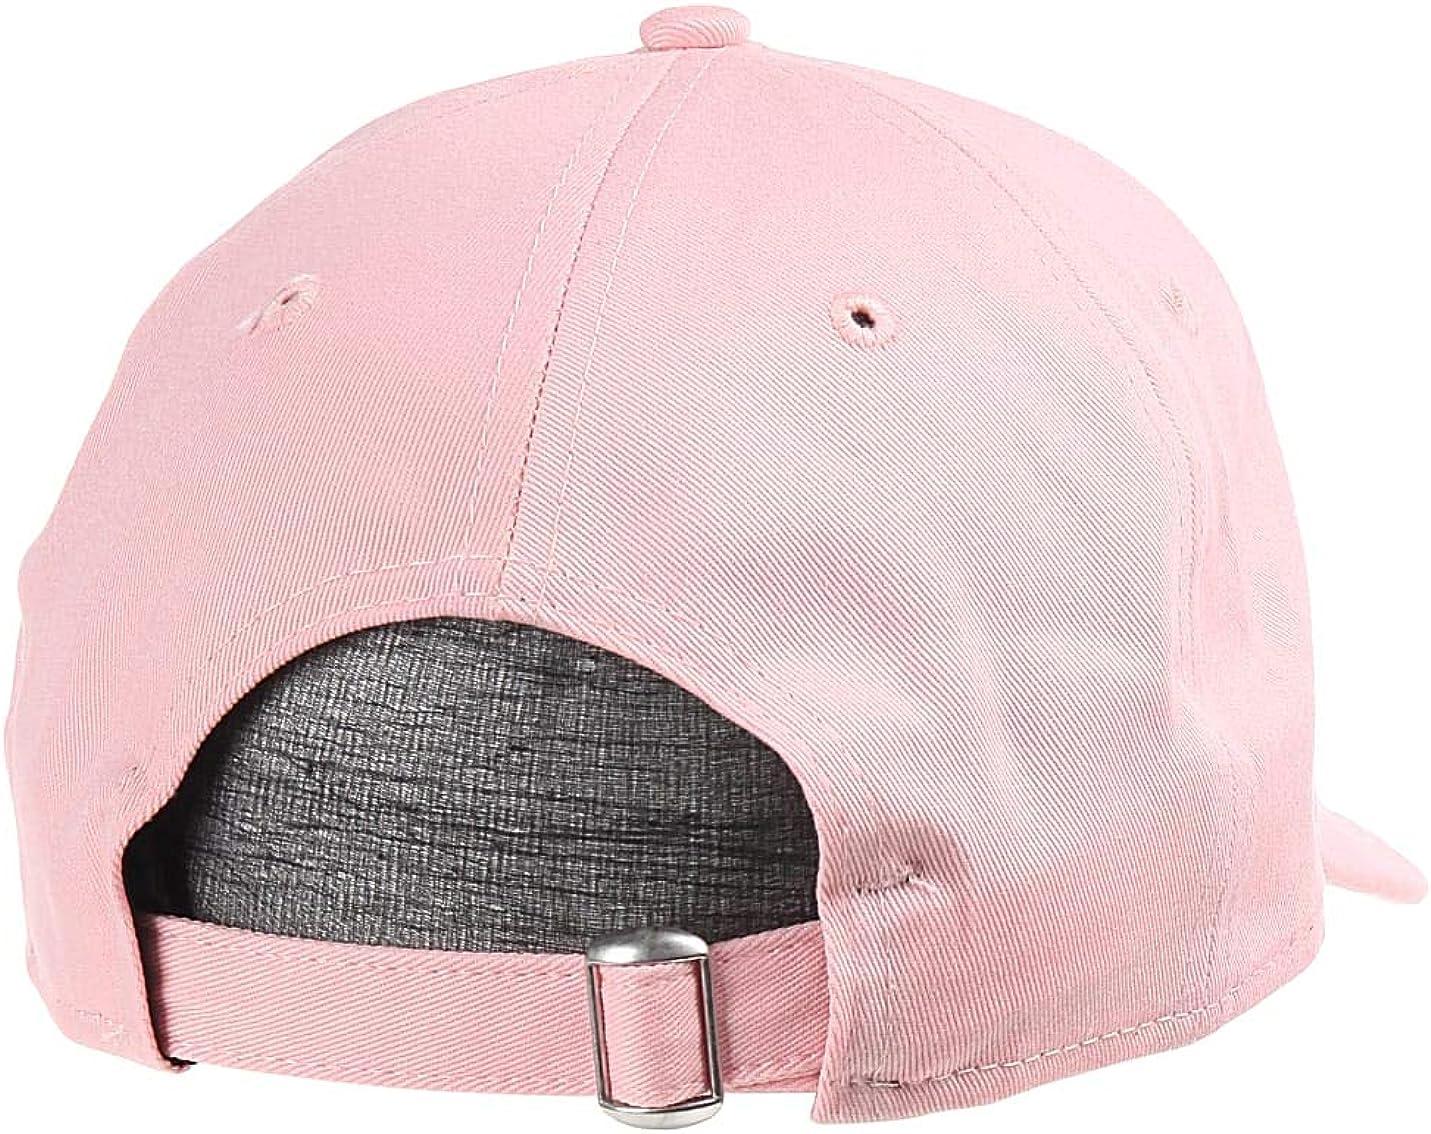 New Era Hats 9TWENTY L.A Dodgers Packable Baseball Cap Light Pink